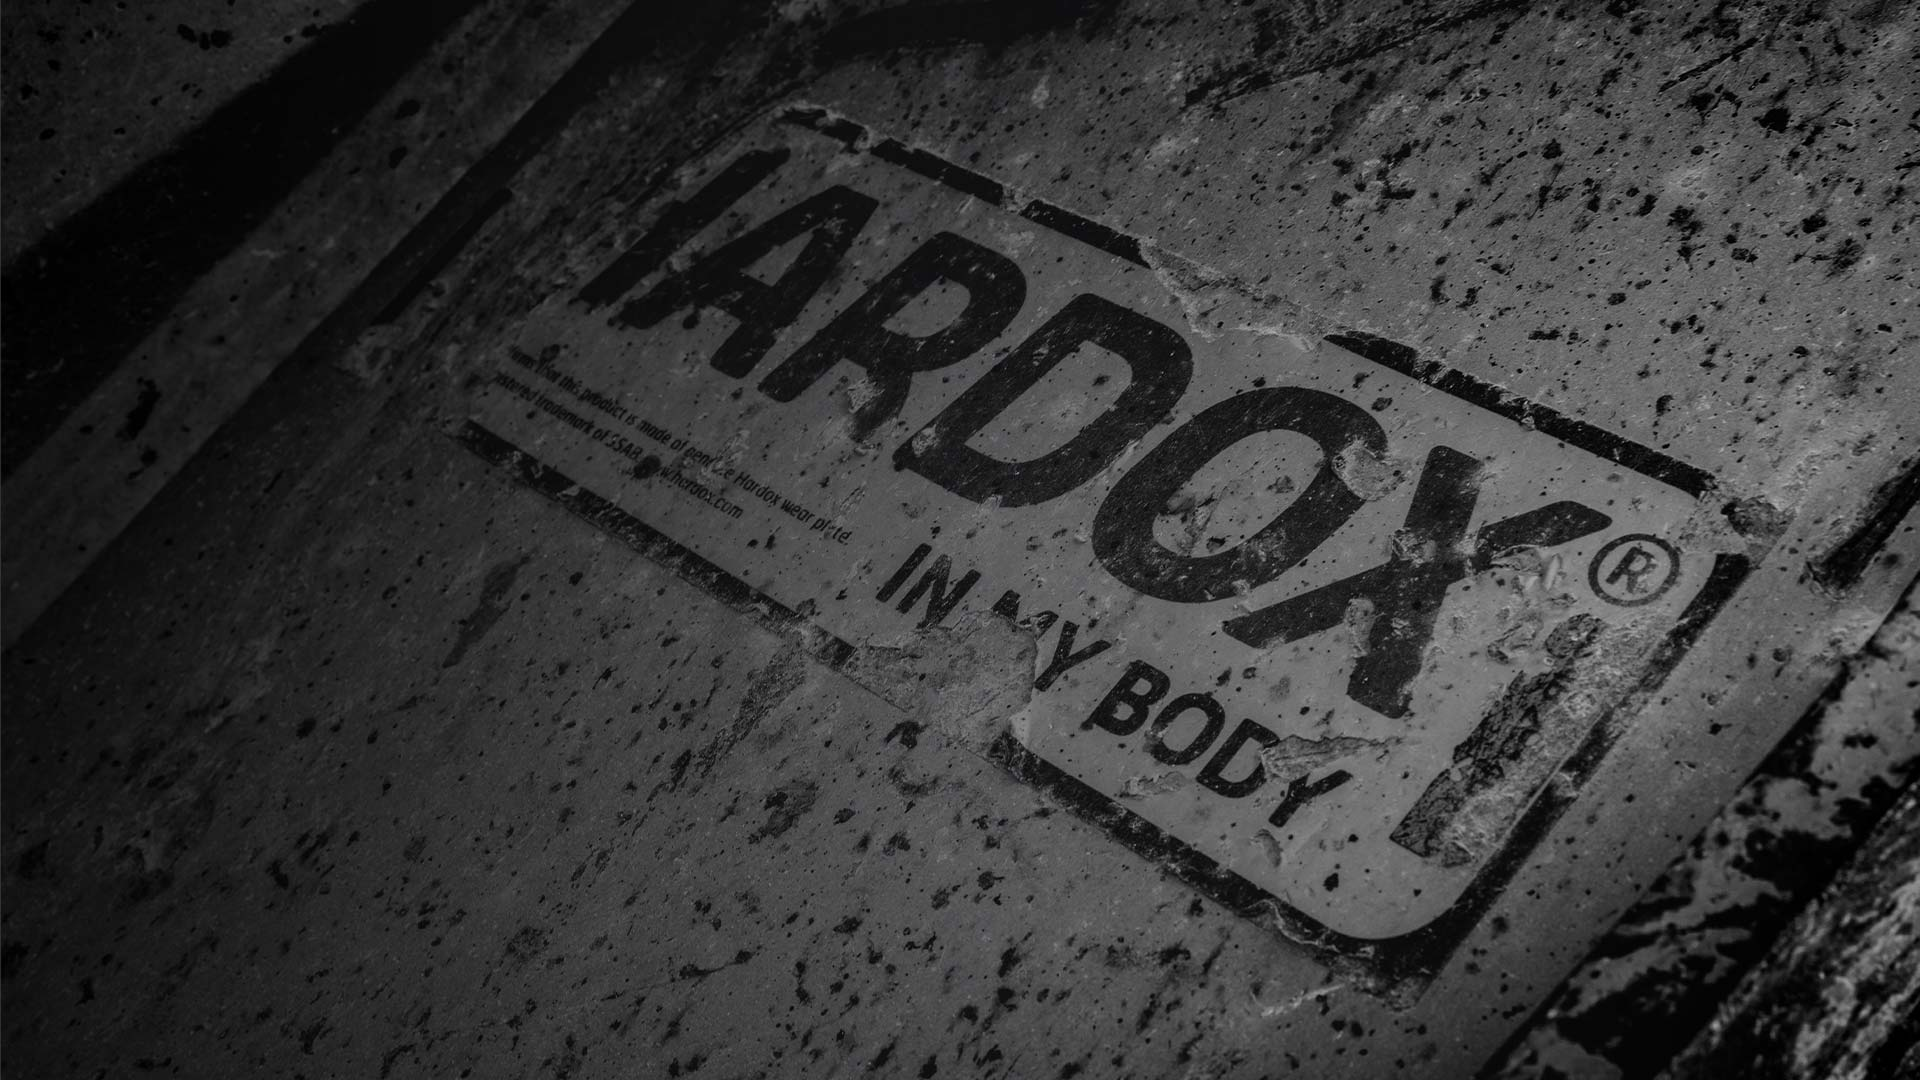 Hardox In My Bodyの刻印